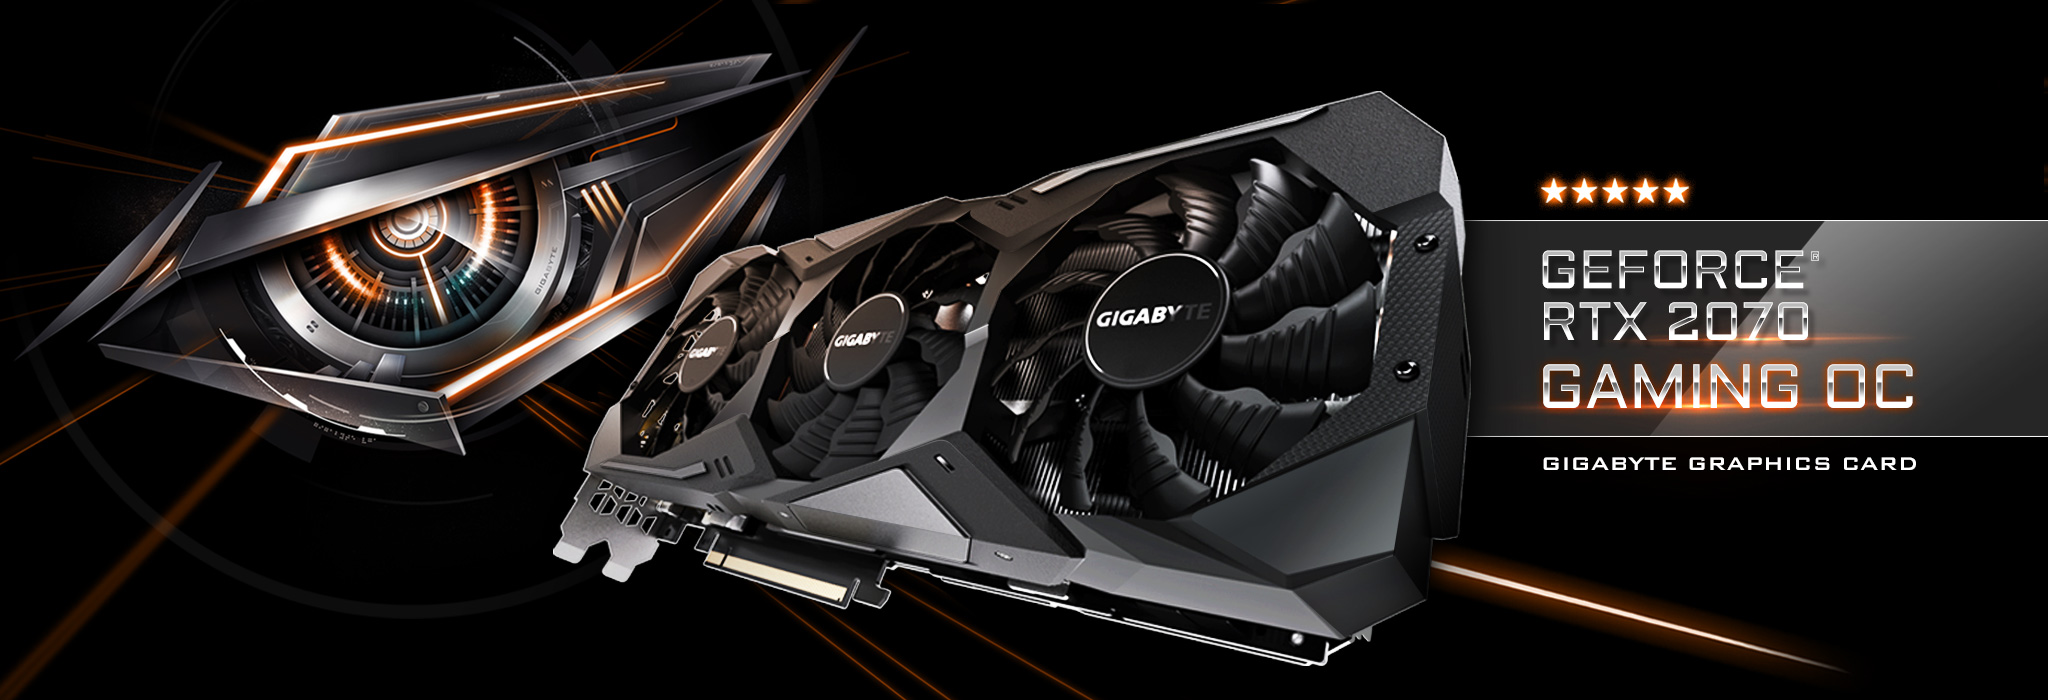 Gigabyte GeForce RTX 2070 Gaming OC 8G Graphics Card 8GB 256-Bit GDDR6 GV-N2070GAMING OC-8GC Video Card 3X Windforce Fans